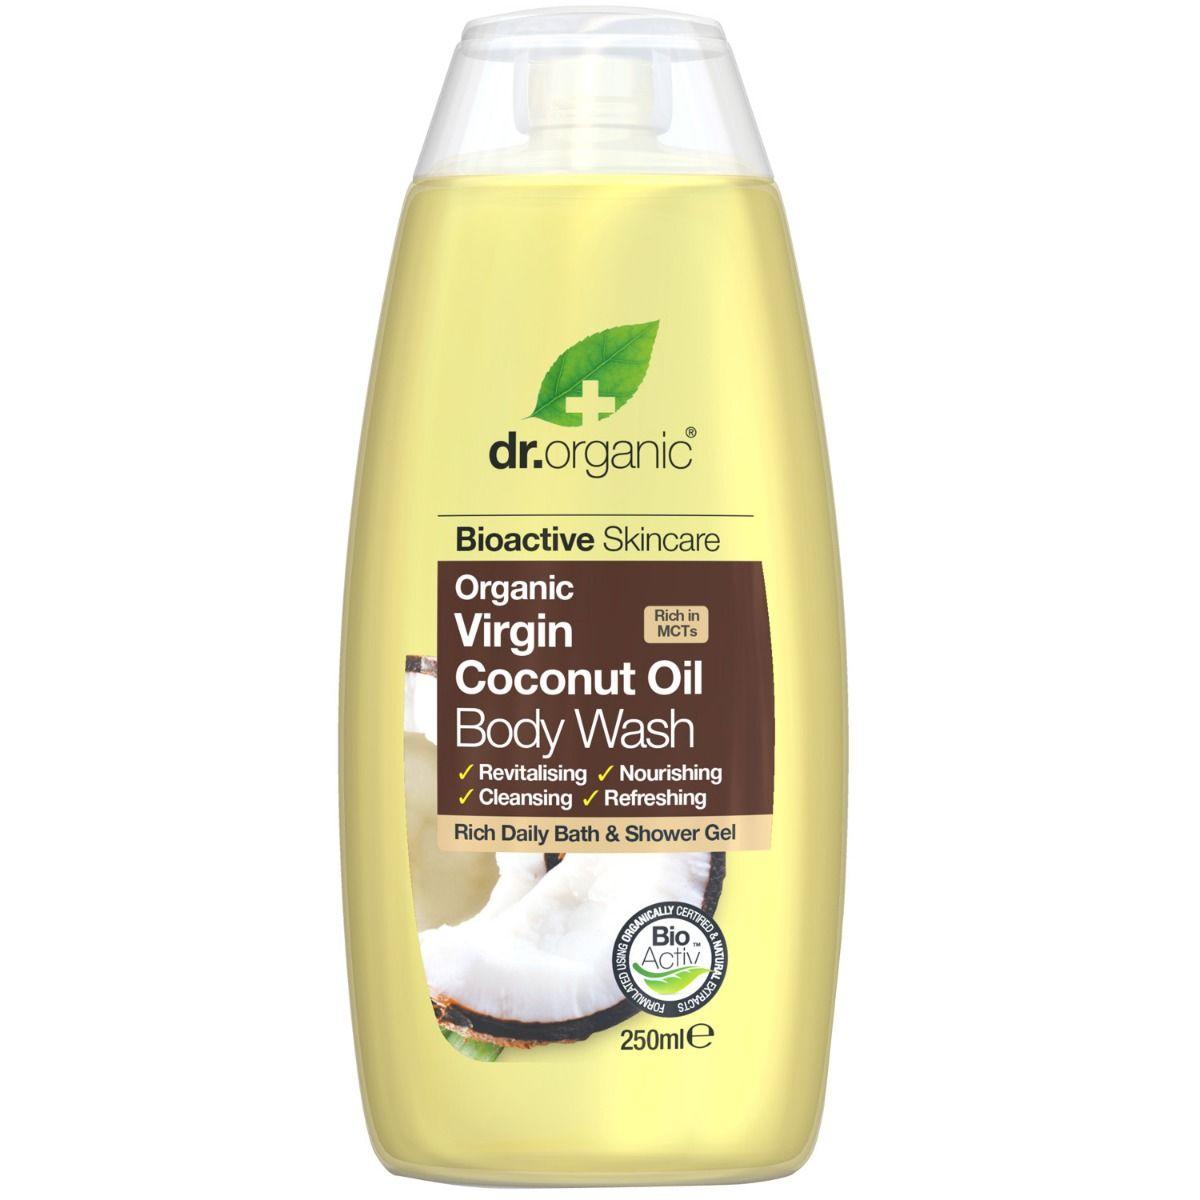 dr Organic Virgin Coconut Oil Body Wash, 250 ml